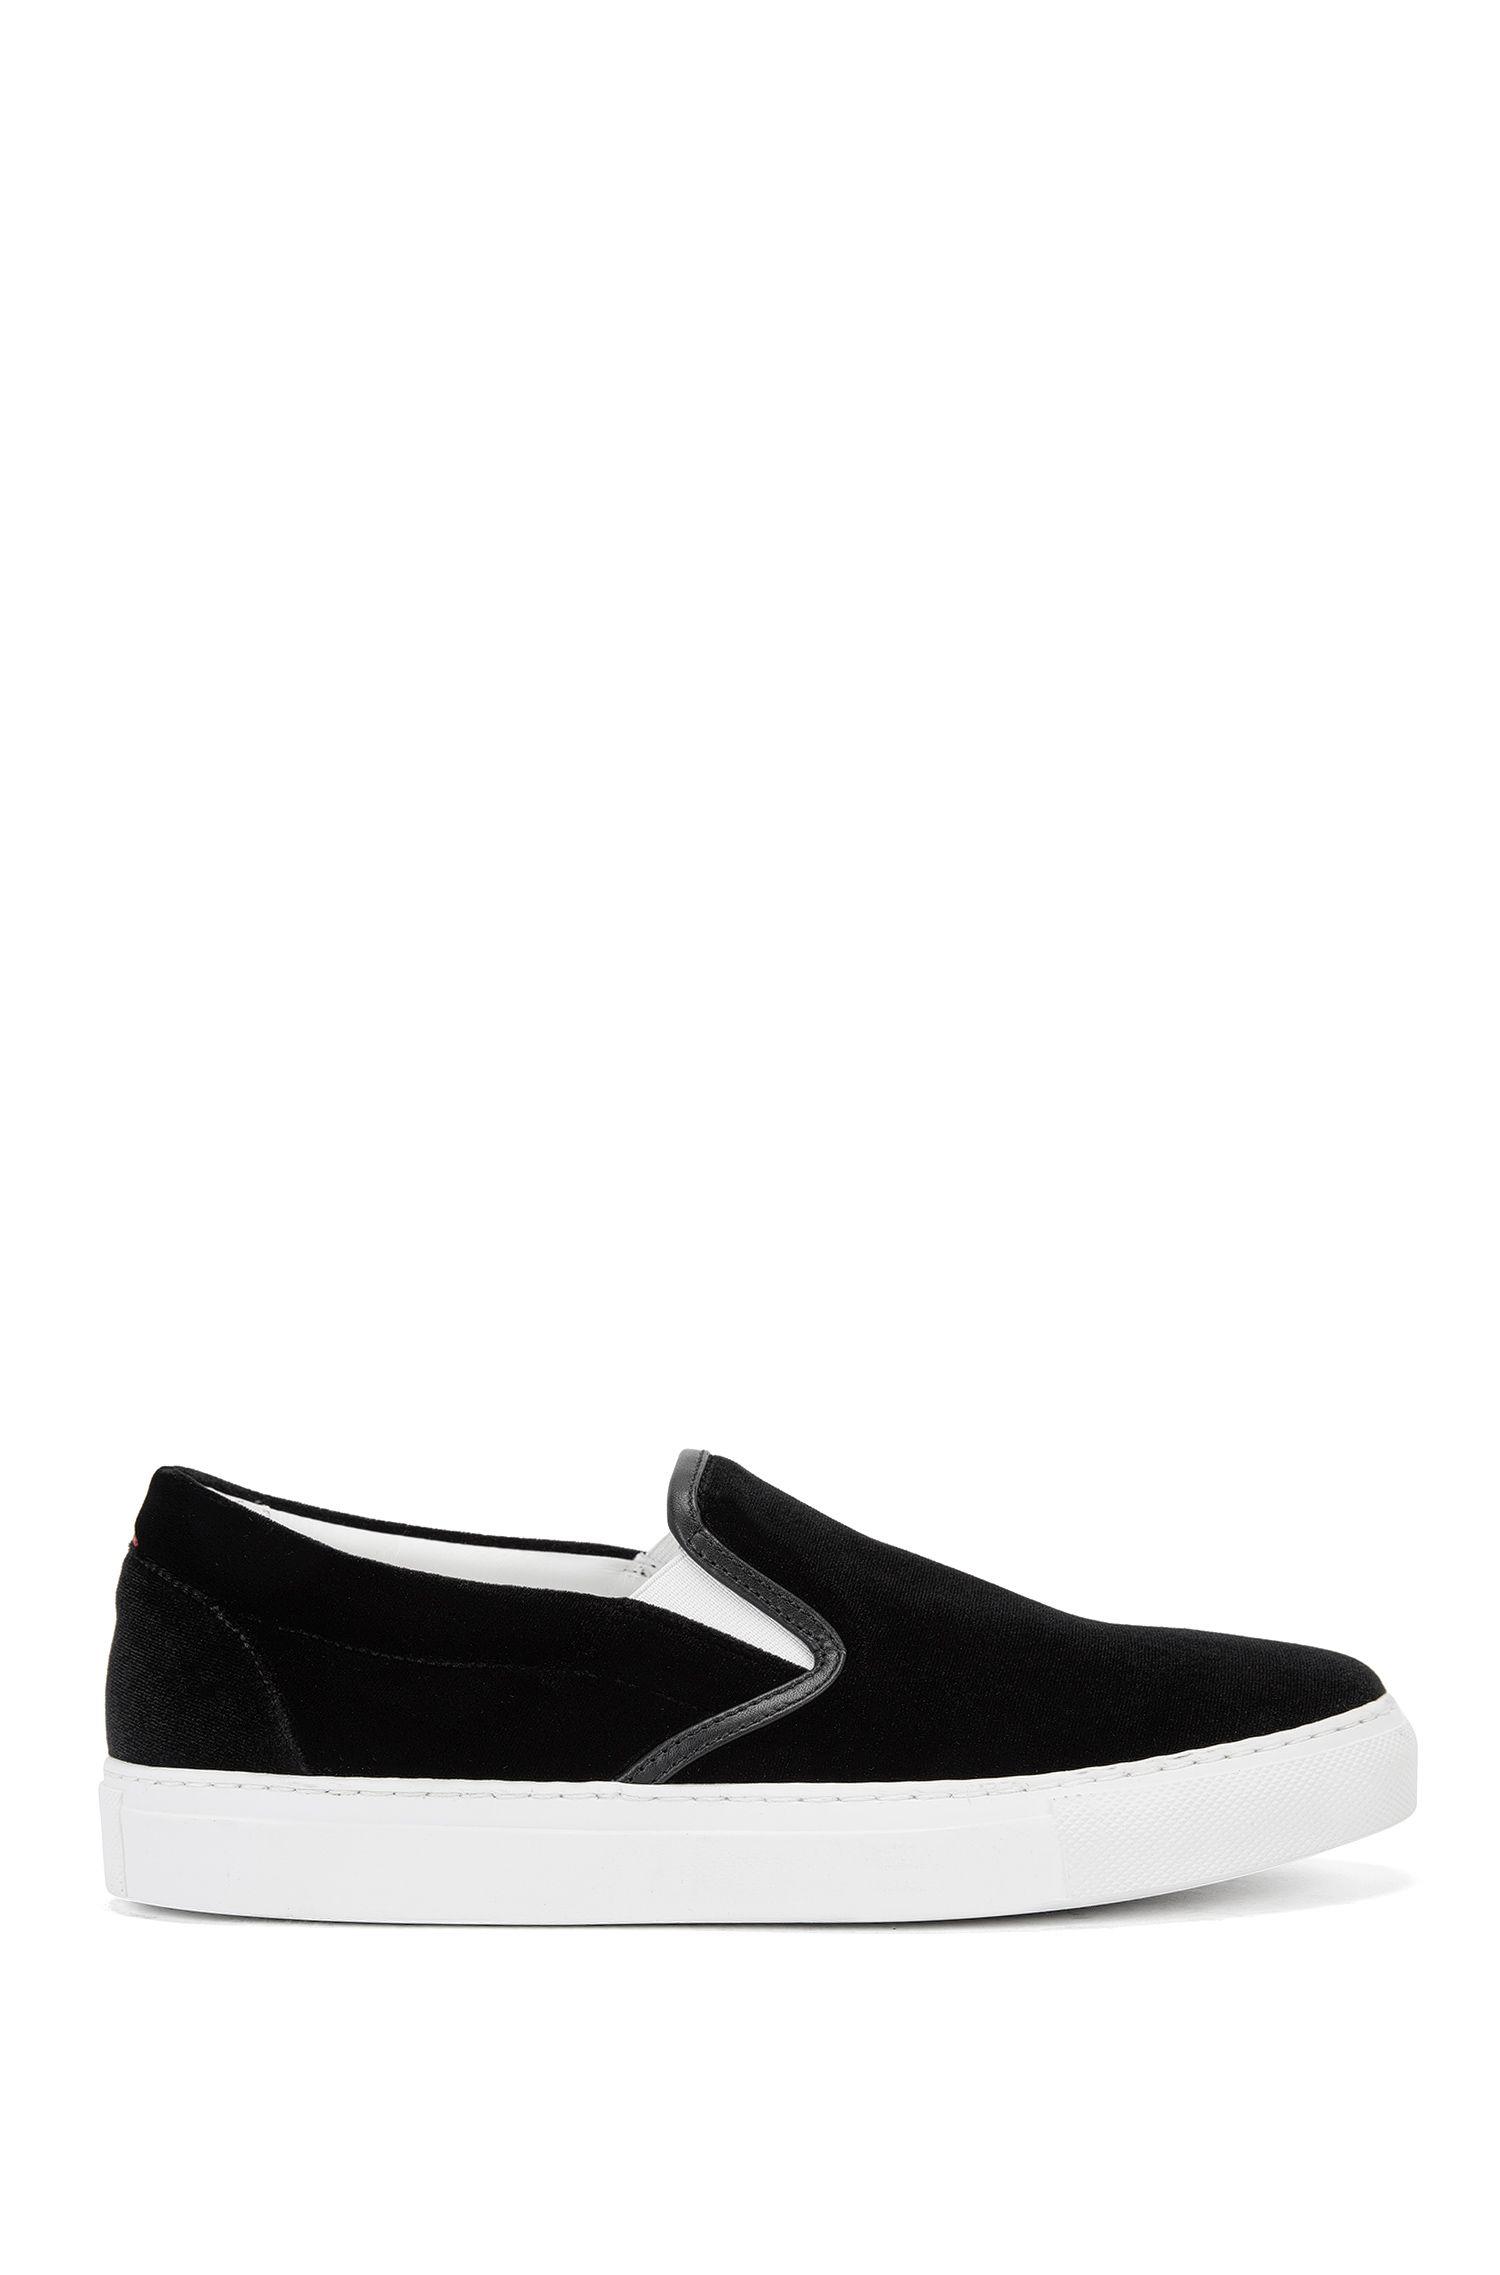 Sneakers slip-on in morbido velluto